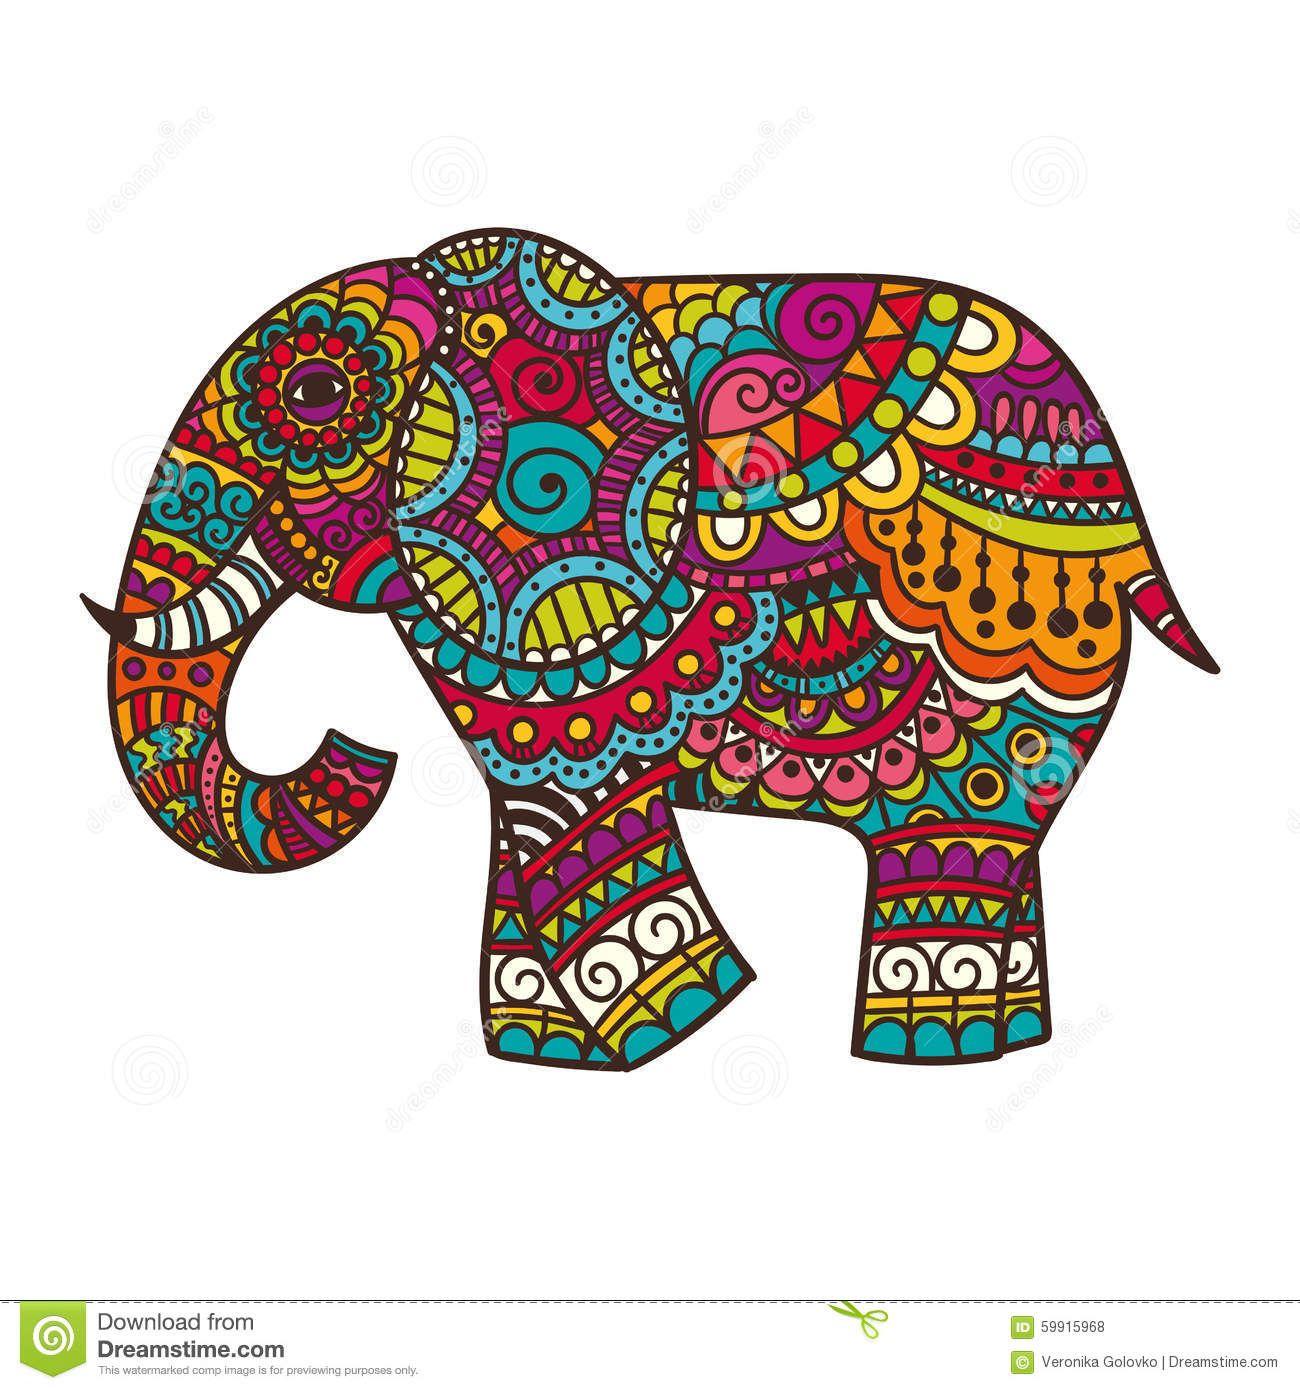 Decorative Elephant Illustration Stock Vector - Image: 59915968